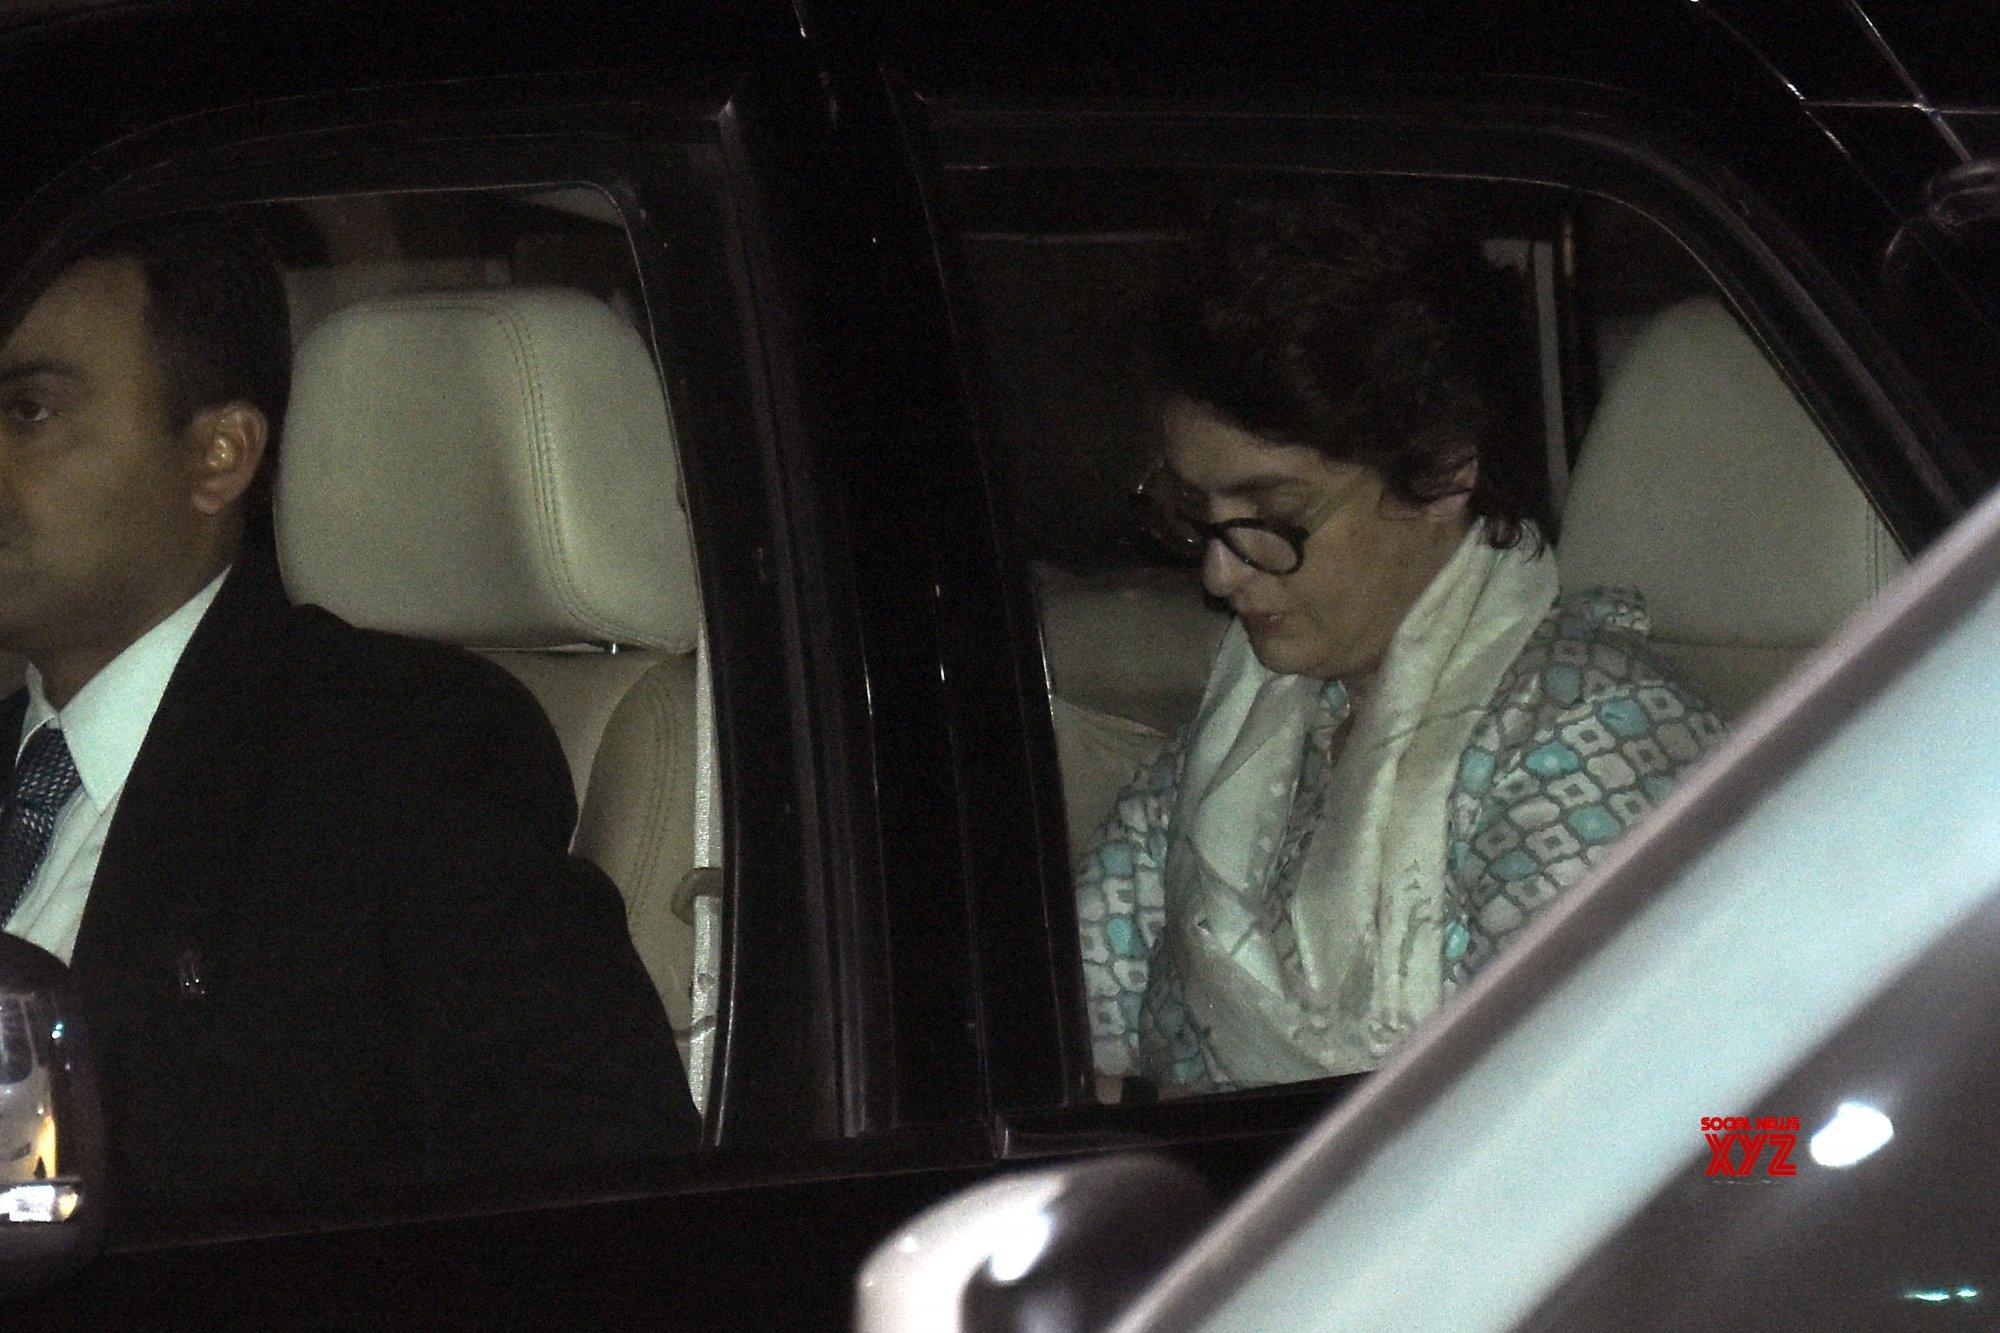 Priyanka in Jaipur, to accompany Robert Vadera to ED office on Tuesday